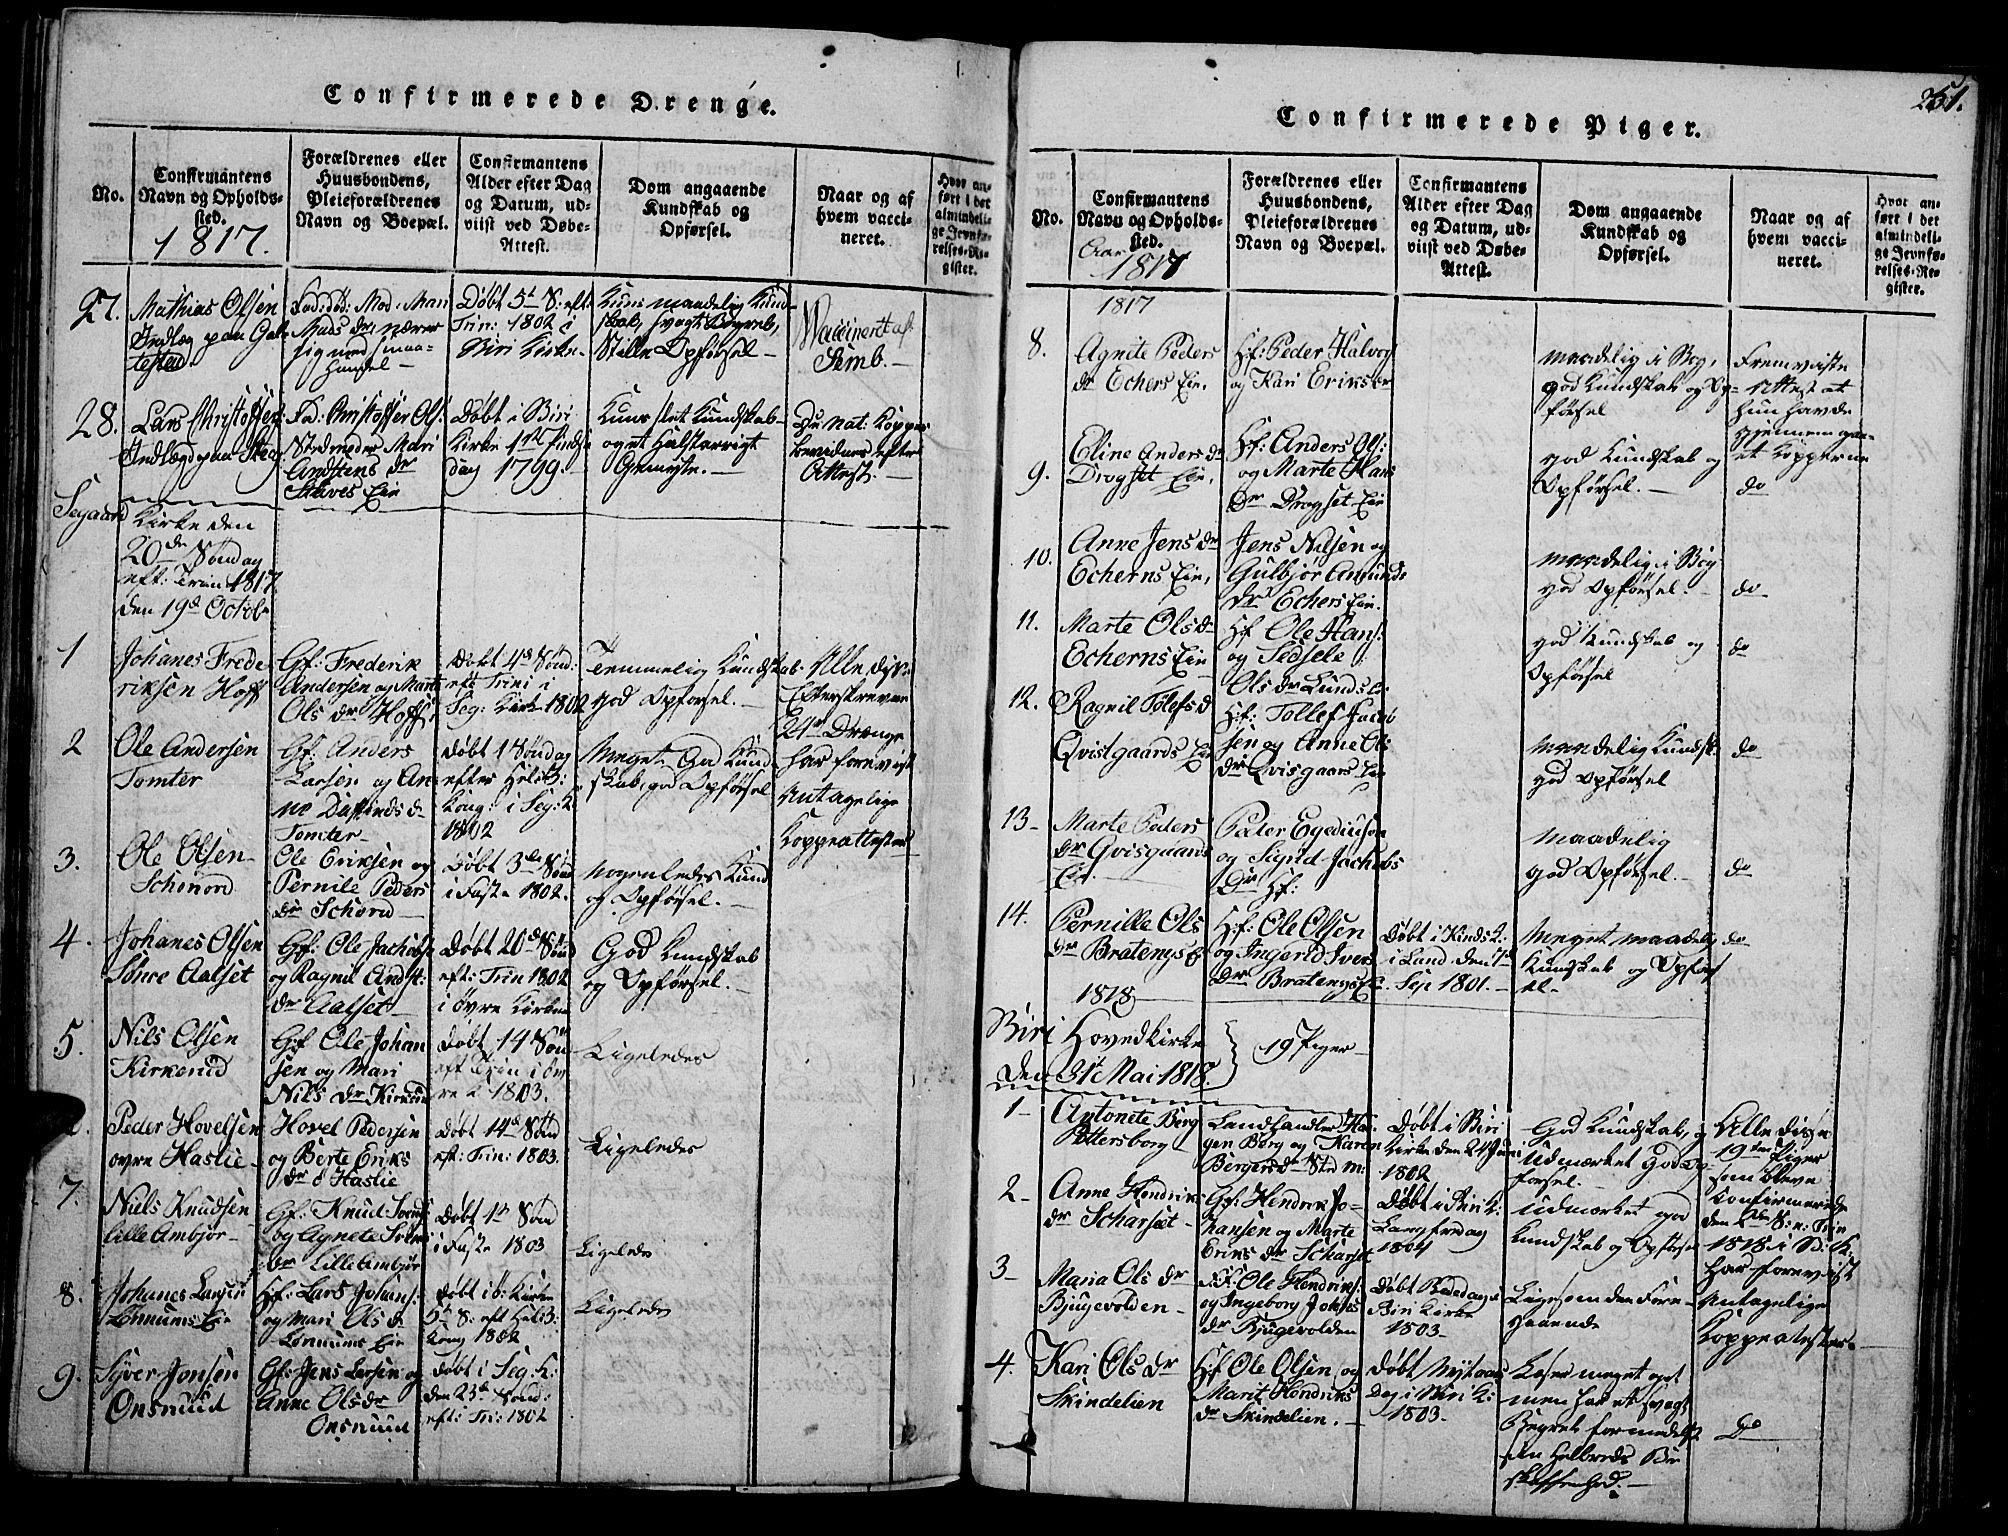 SAH, Biri prestekontor, Ministerialbok nr. 3, 1814-1828, s. 251